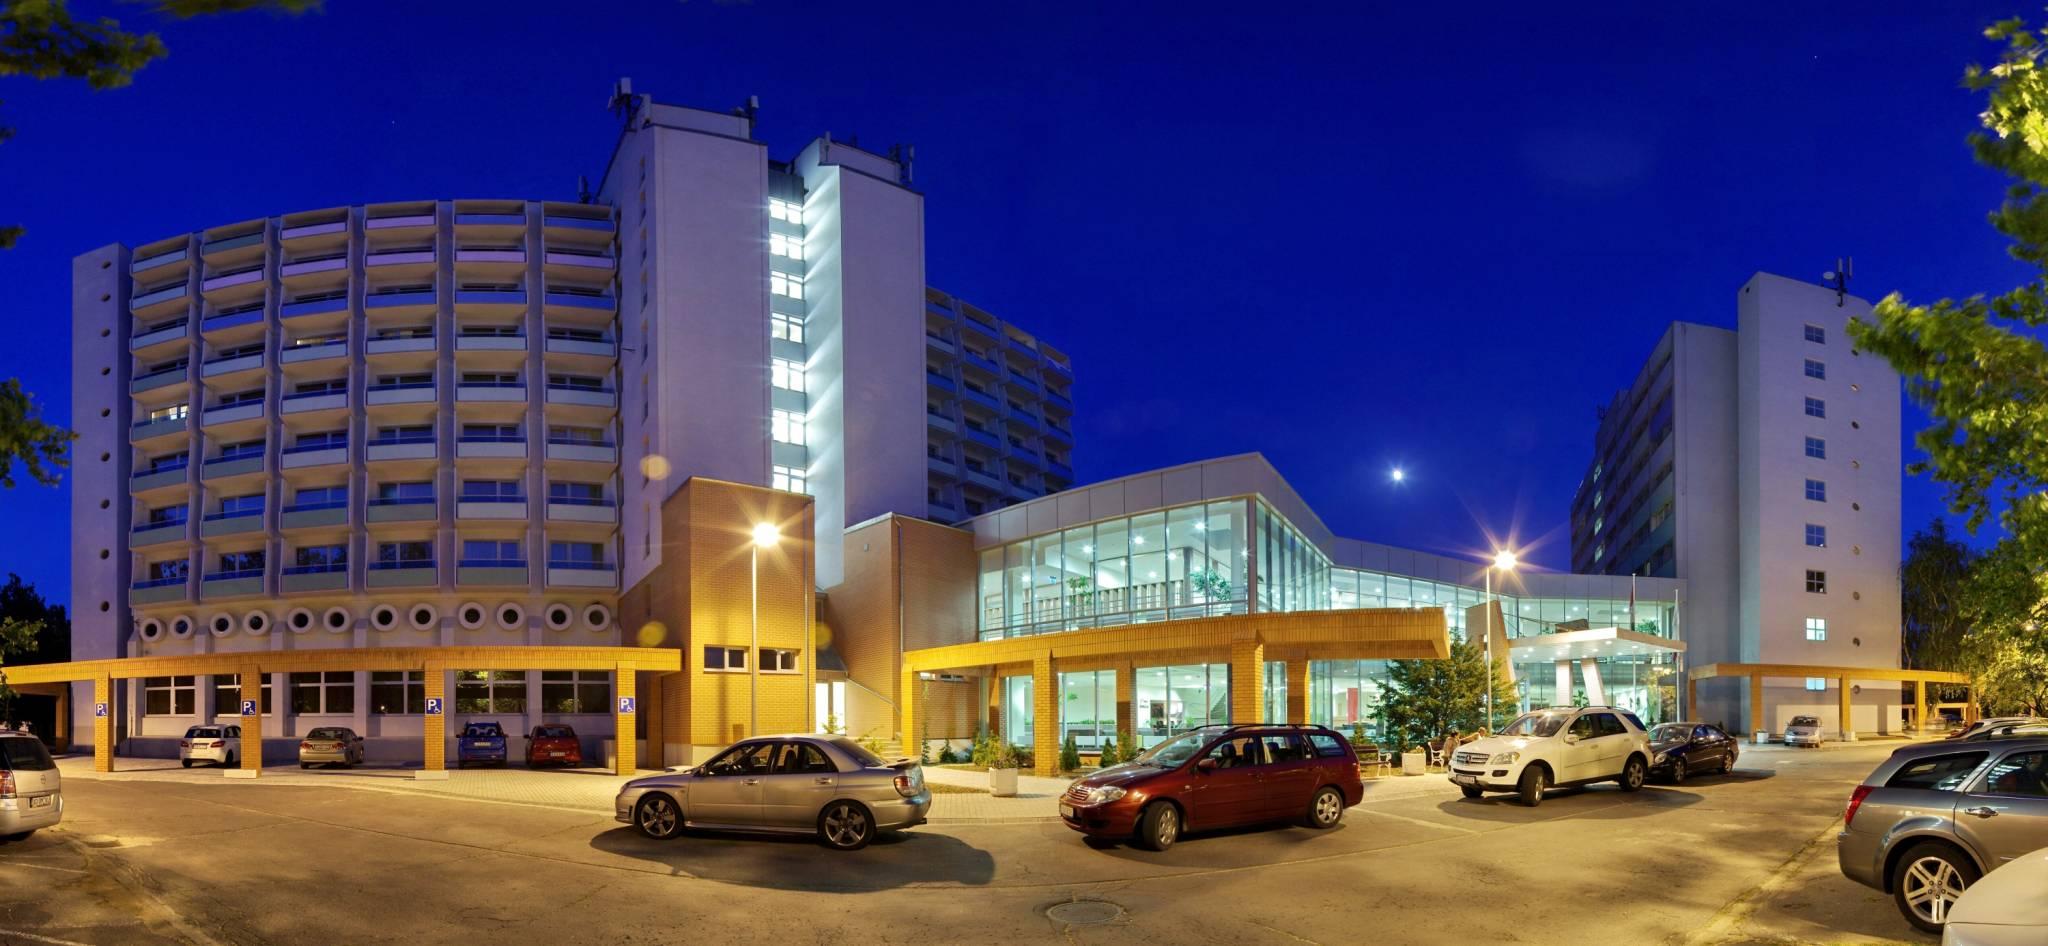 Hotel Erkel Gyula 1